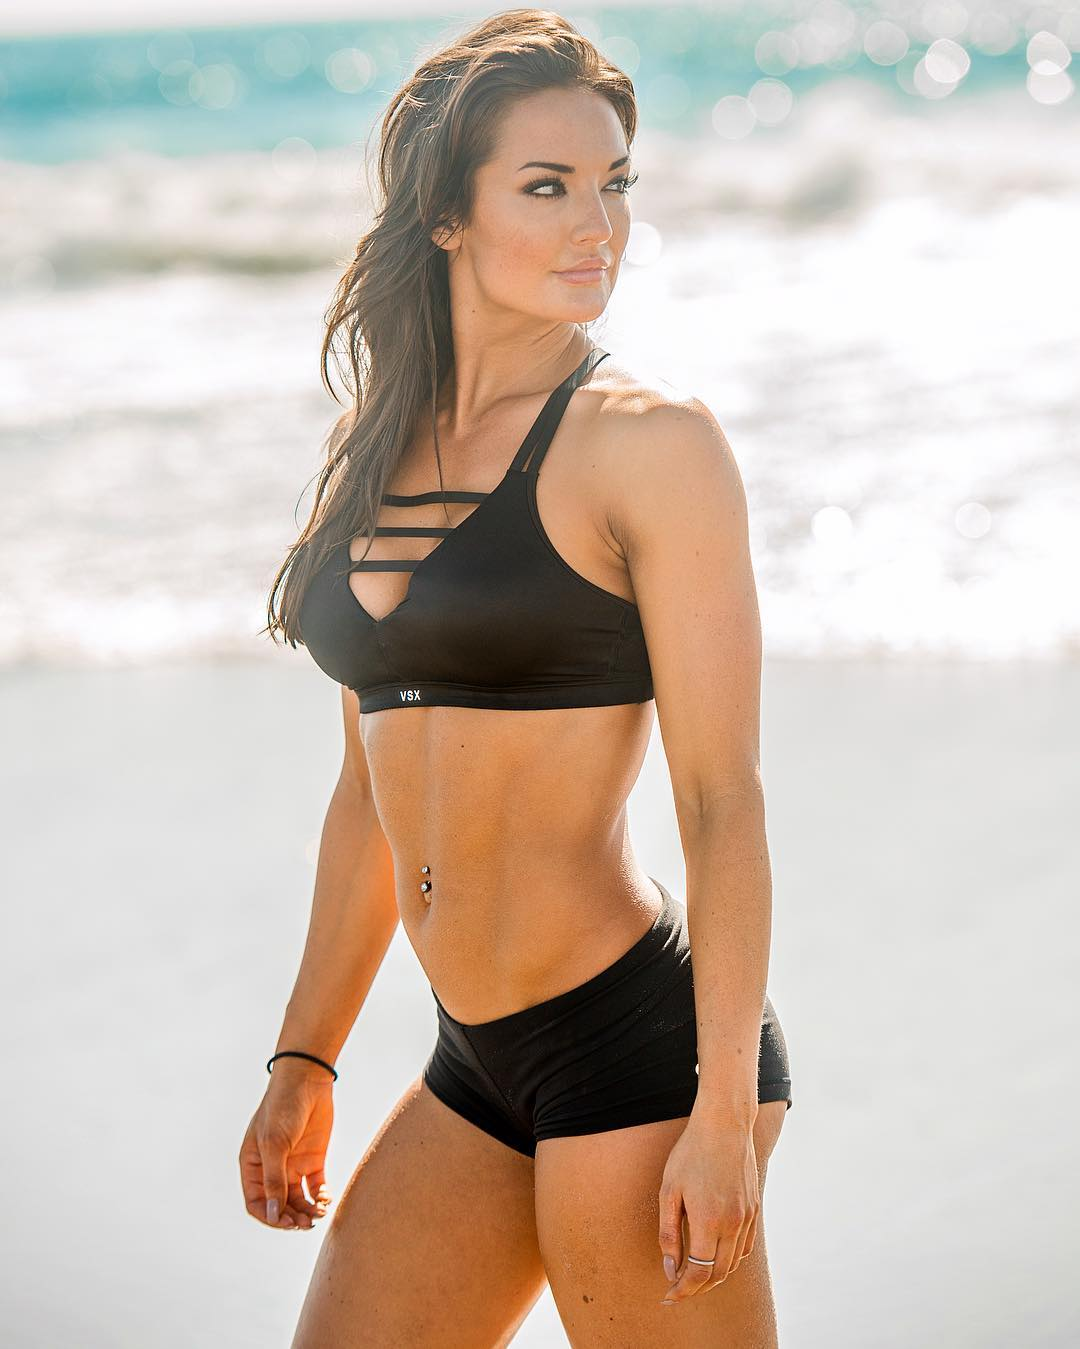 Images Carlota Ensenat naked (42 foto and video), Tits, Leaked, Boobs, in bikini 2020